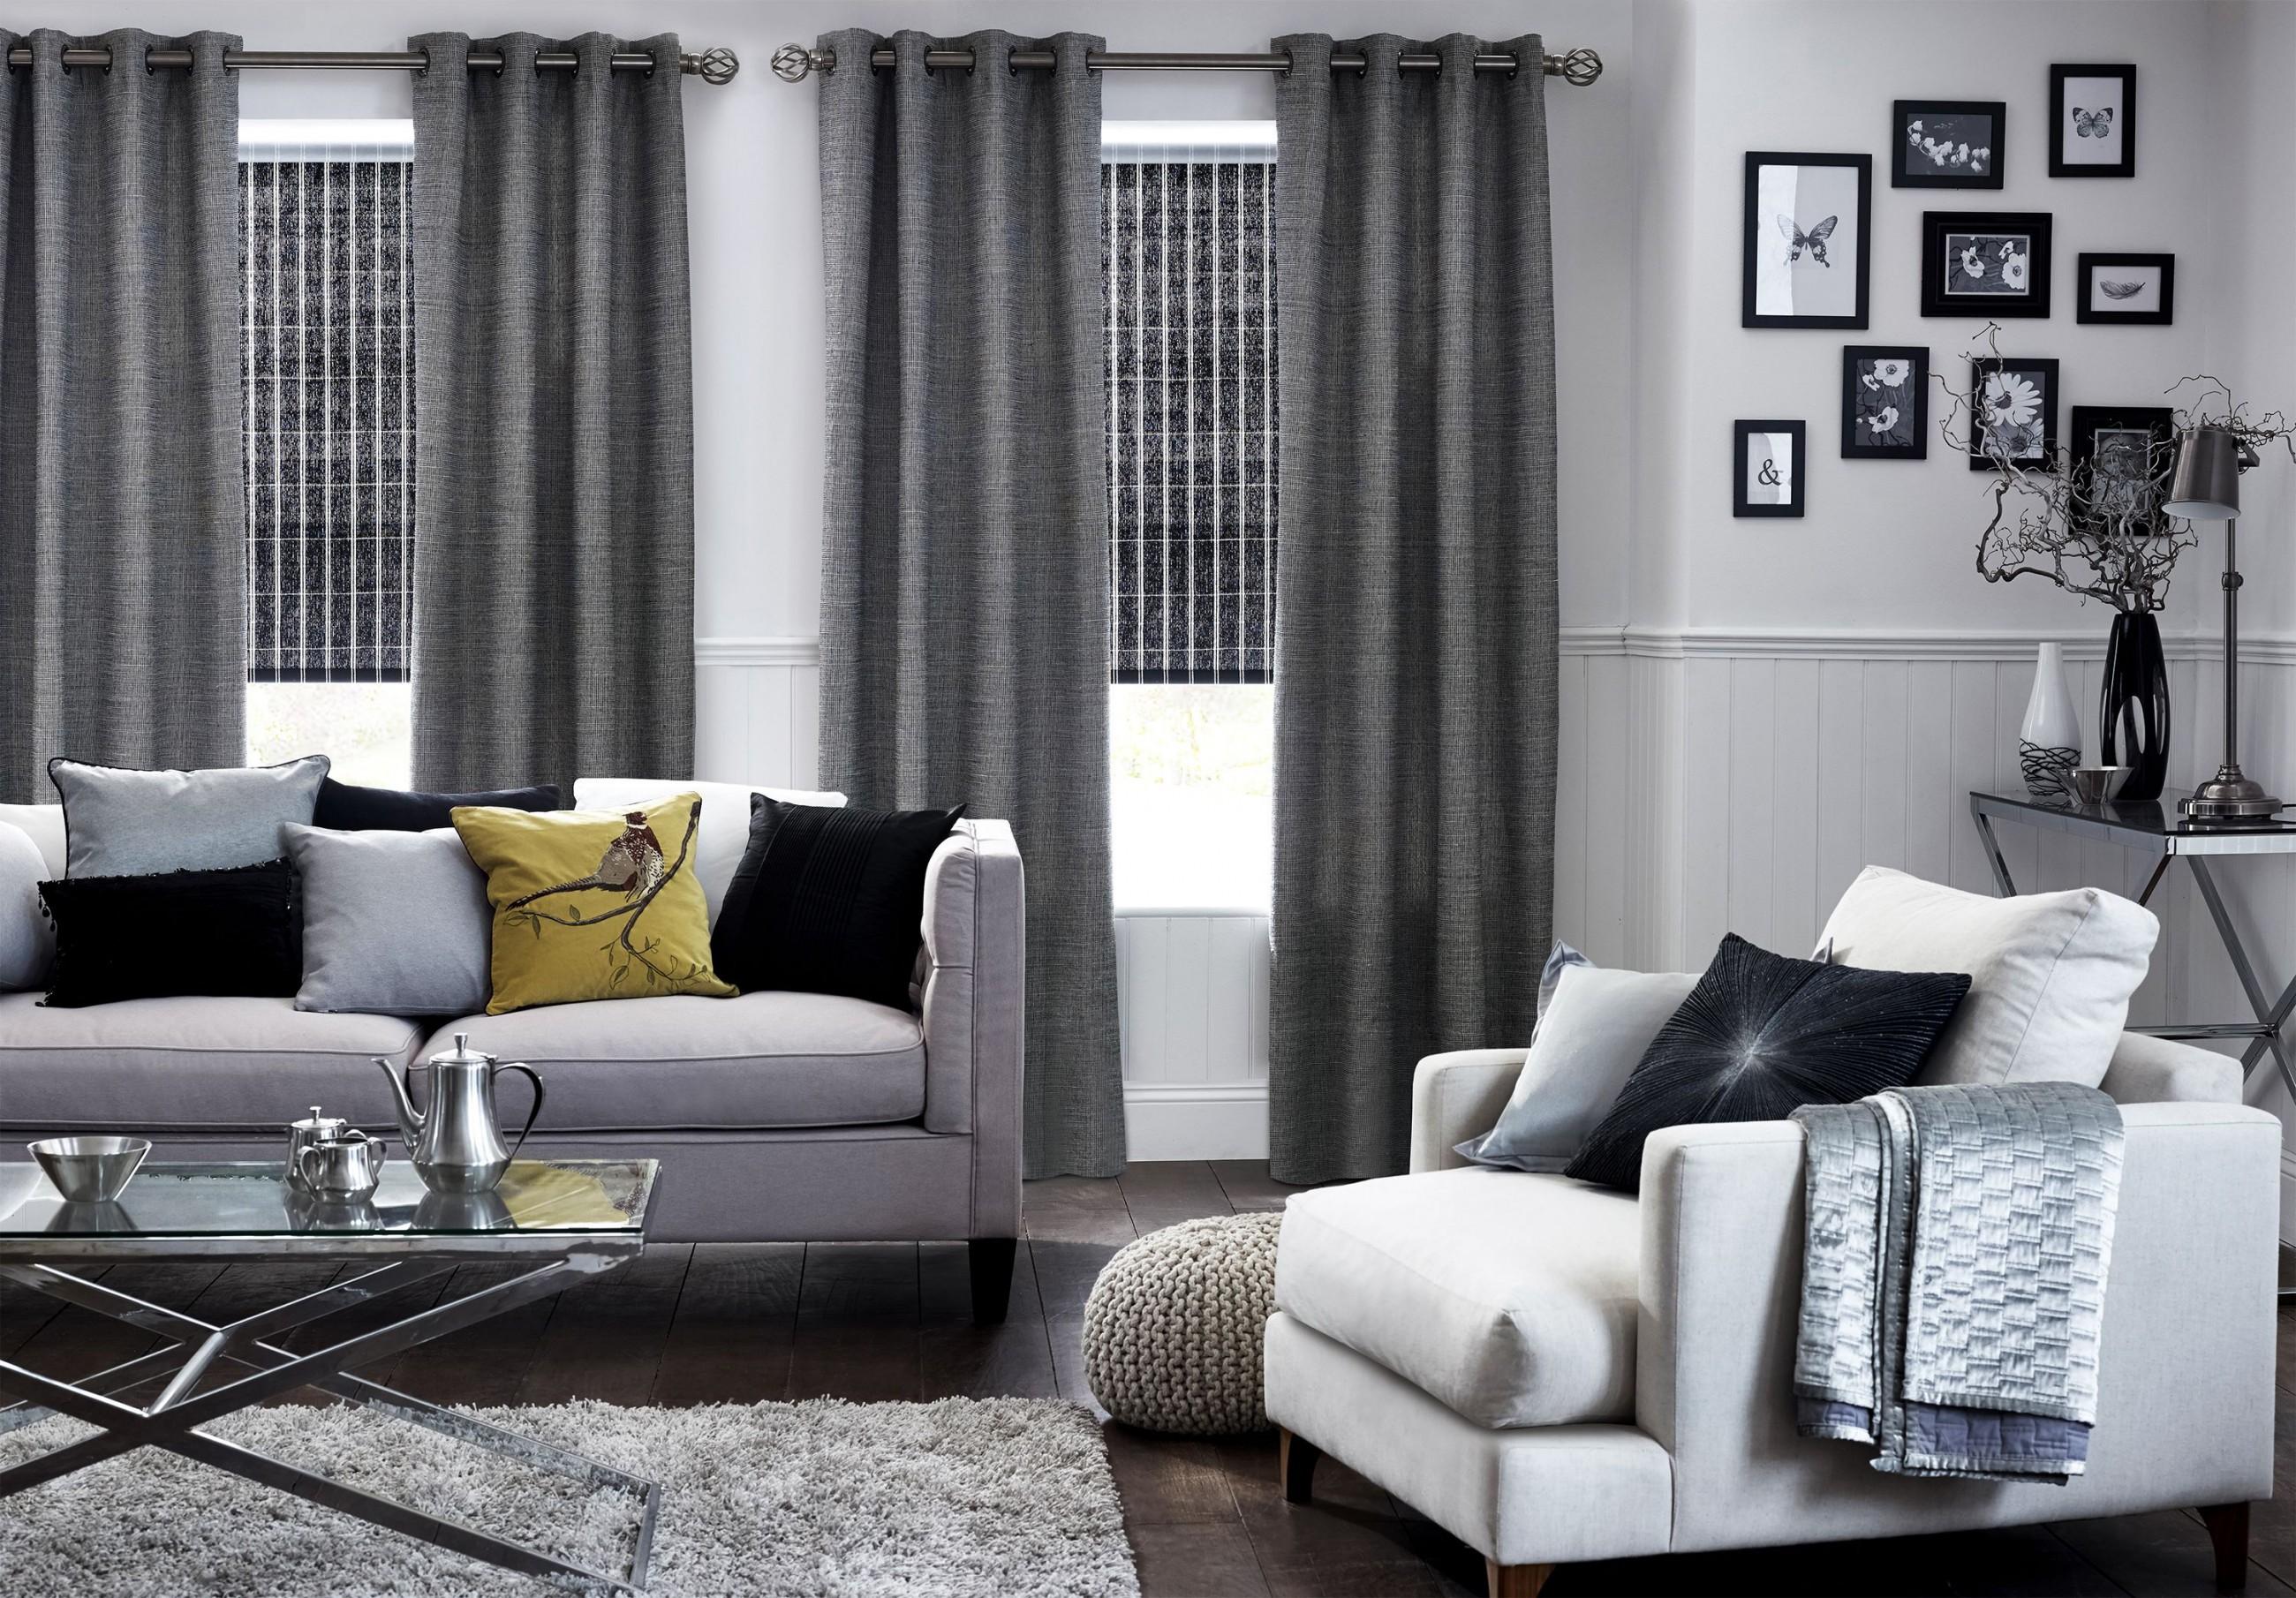 картинки серые обои и шторы материалы, которые стоят